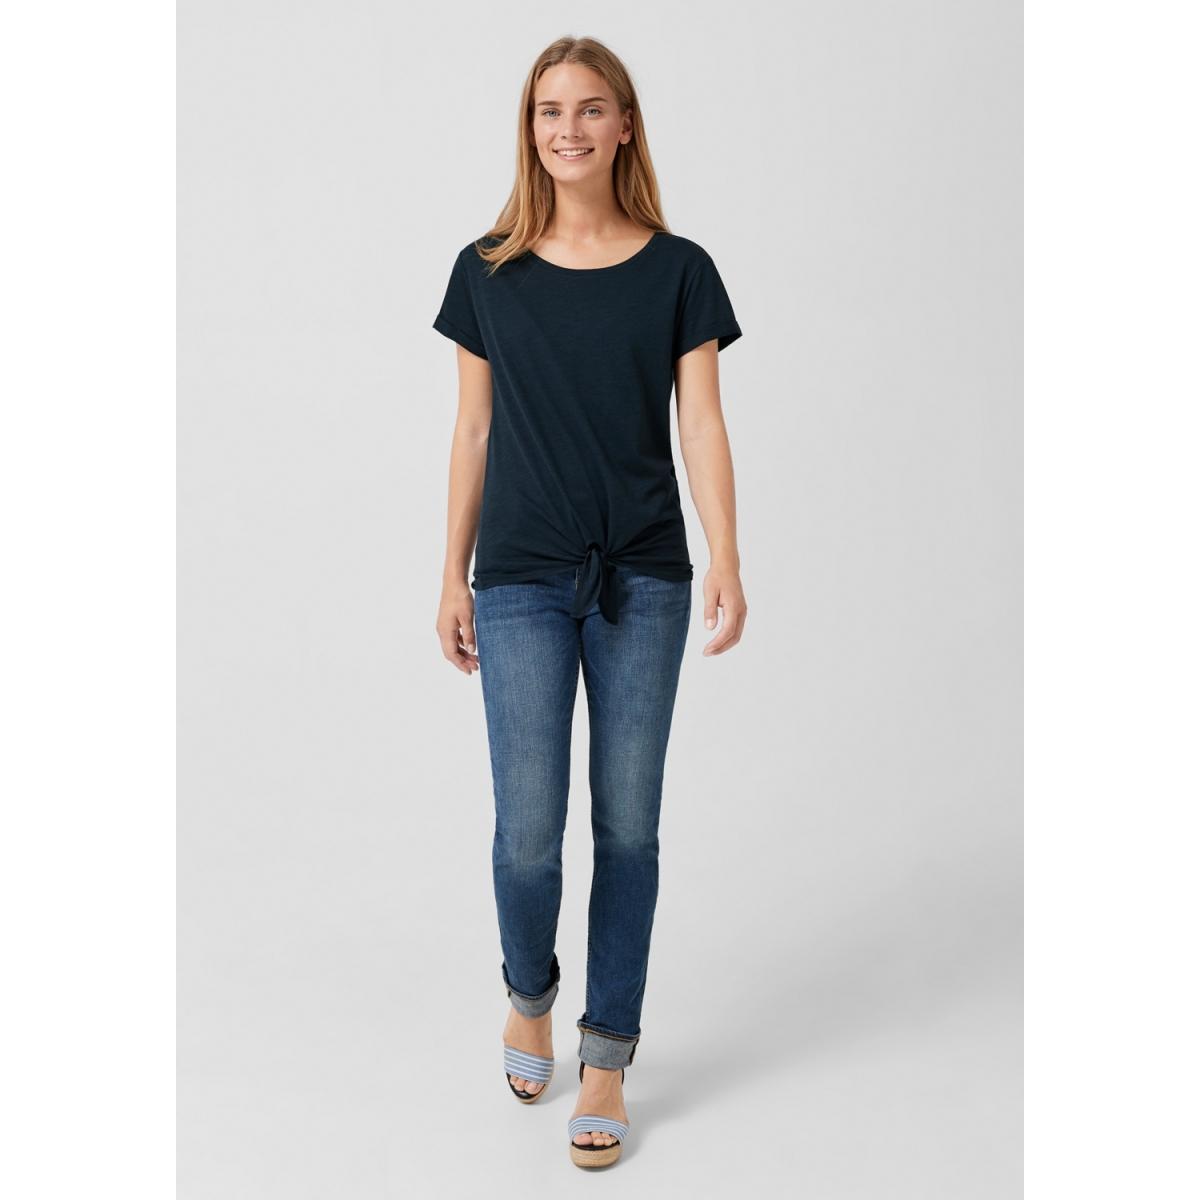 t shirt 21907324551 s.oliver t-shirt 5959